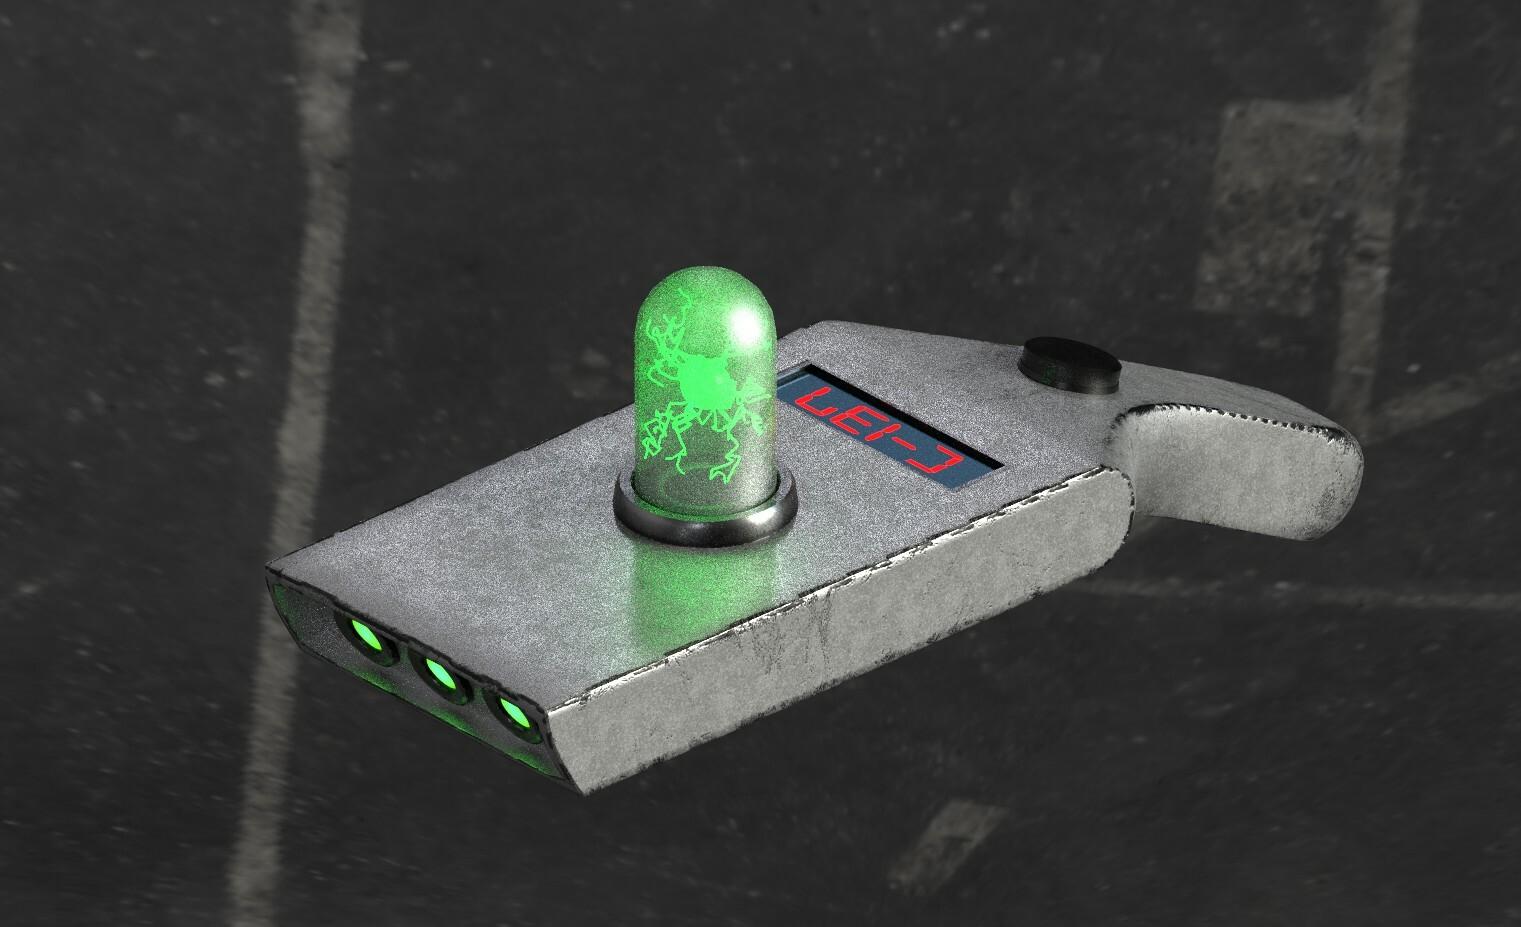 ArtStation - Portal gun, Chris Mauro